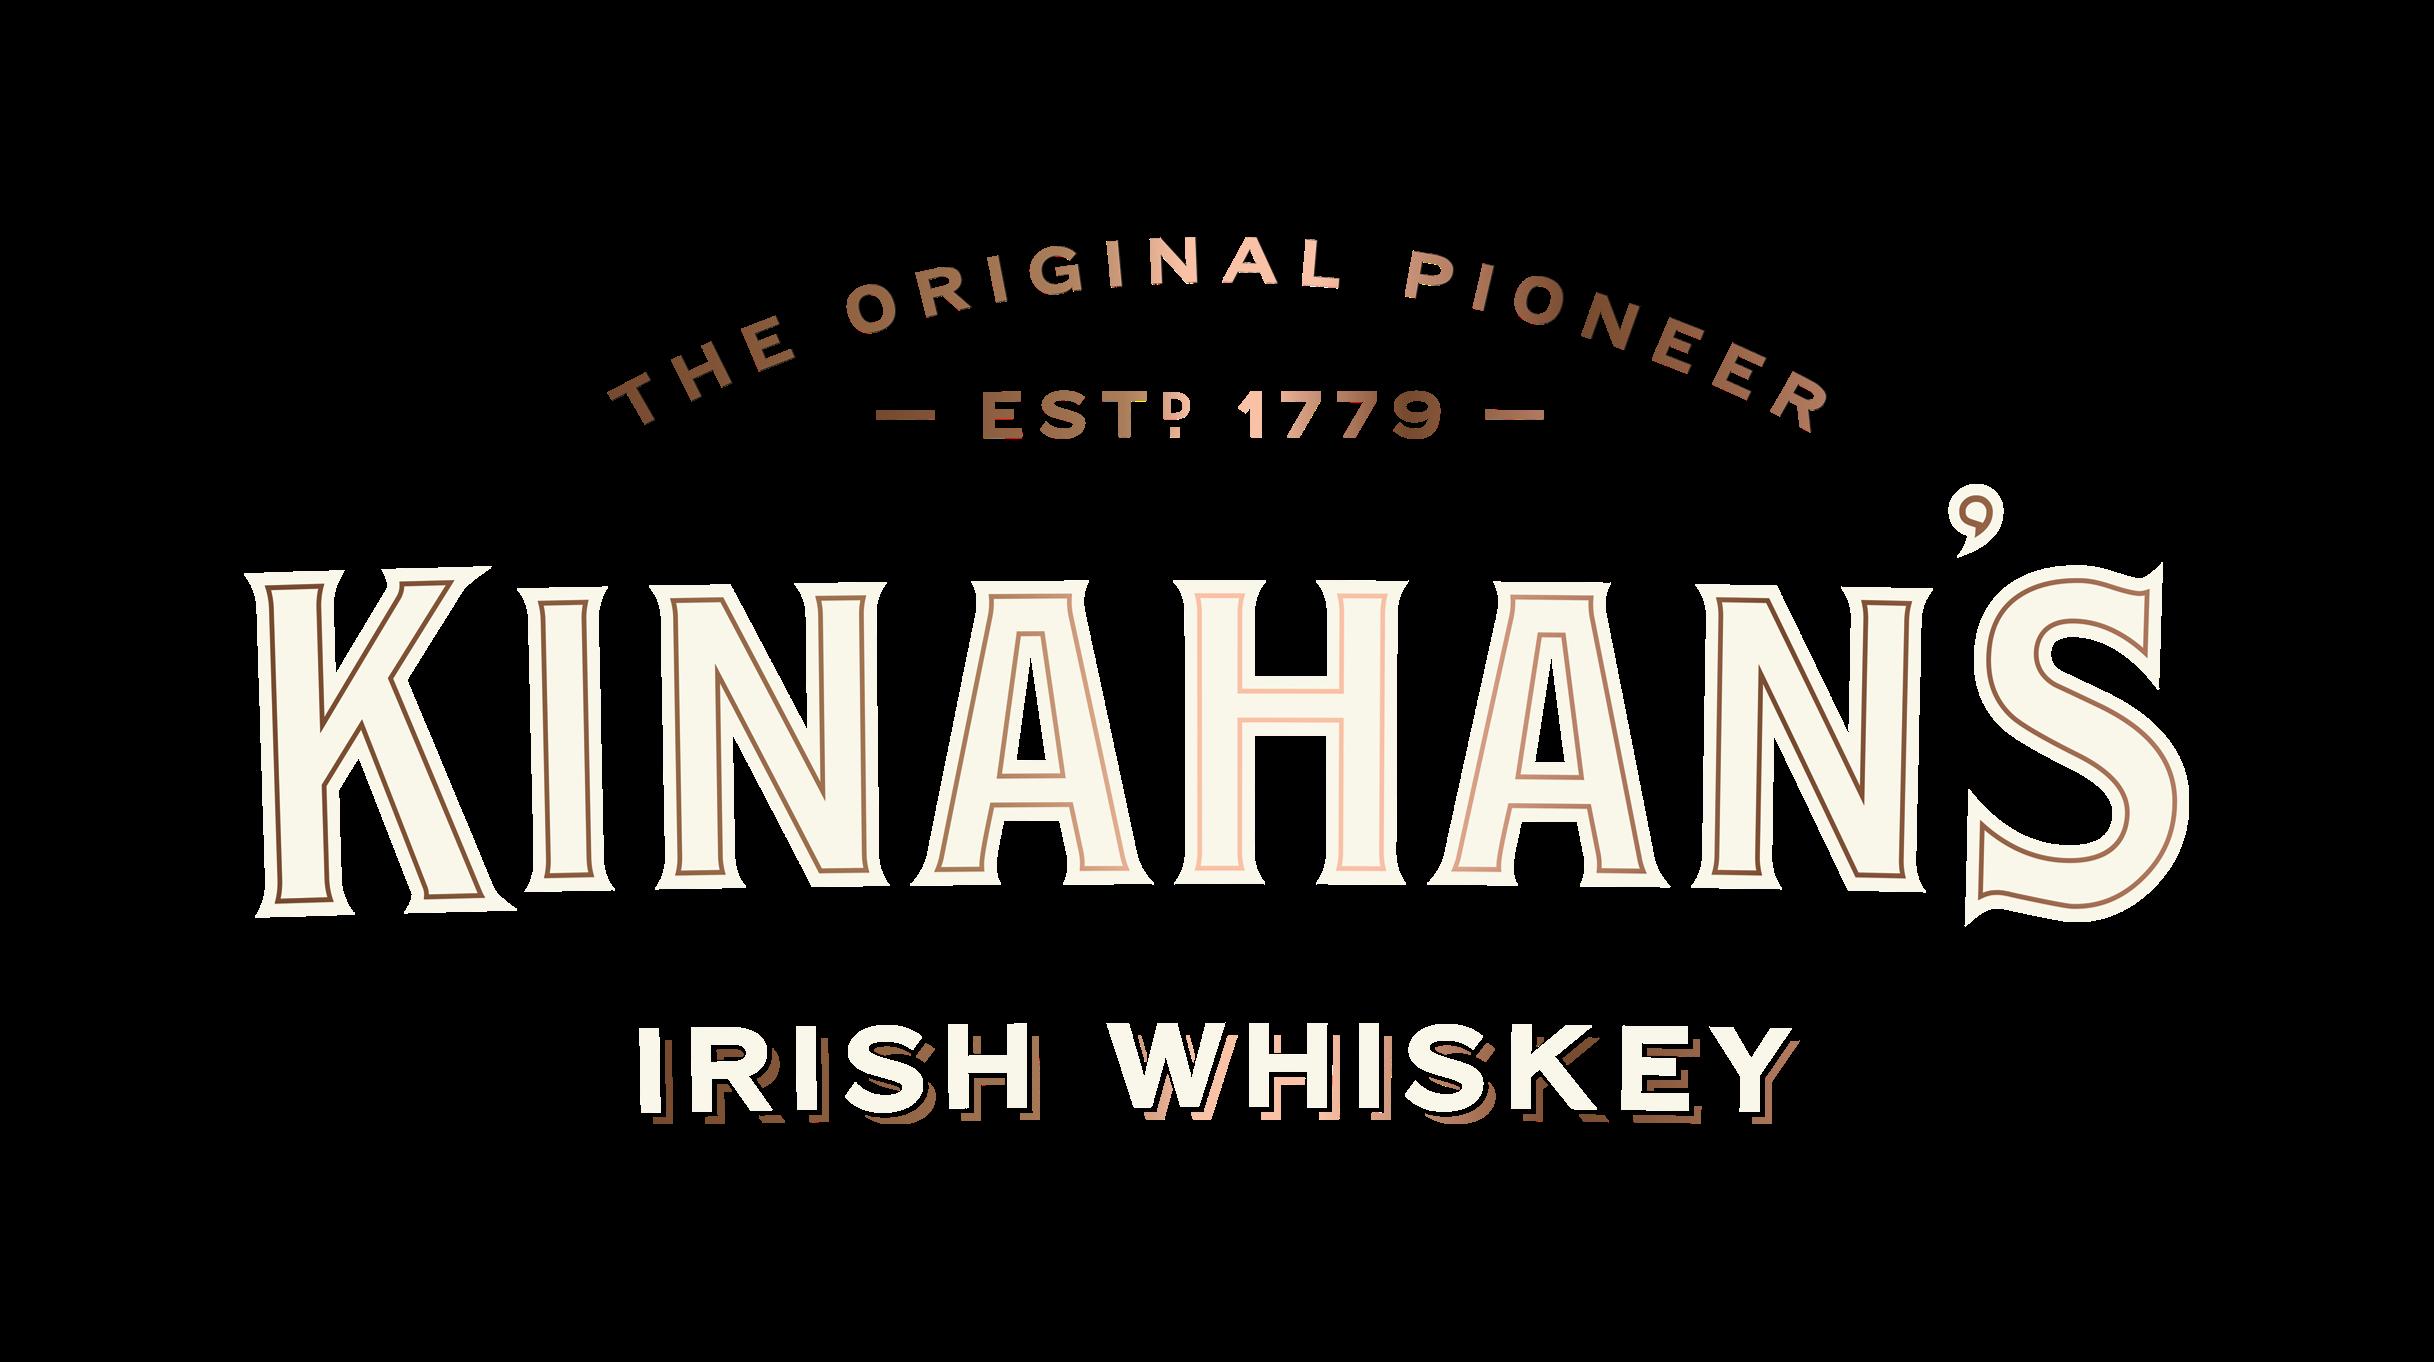 Kinahan's Irish Whiskey